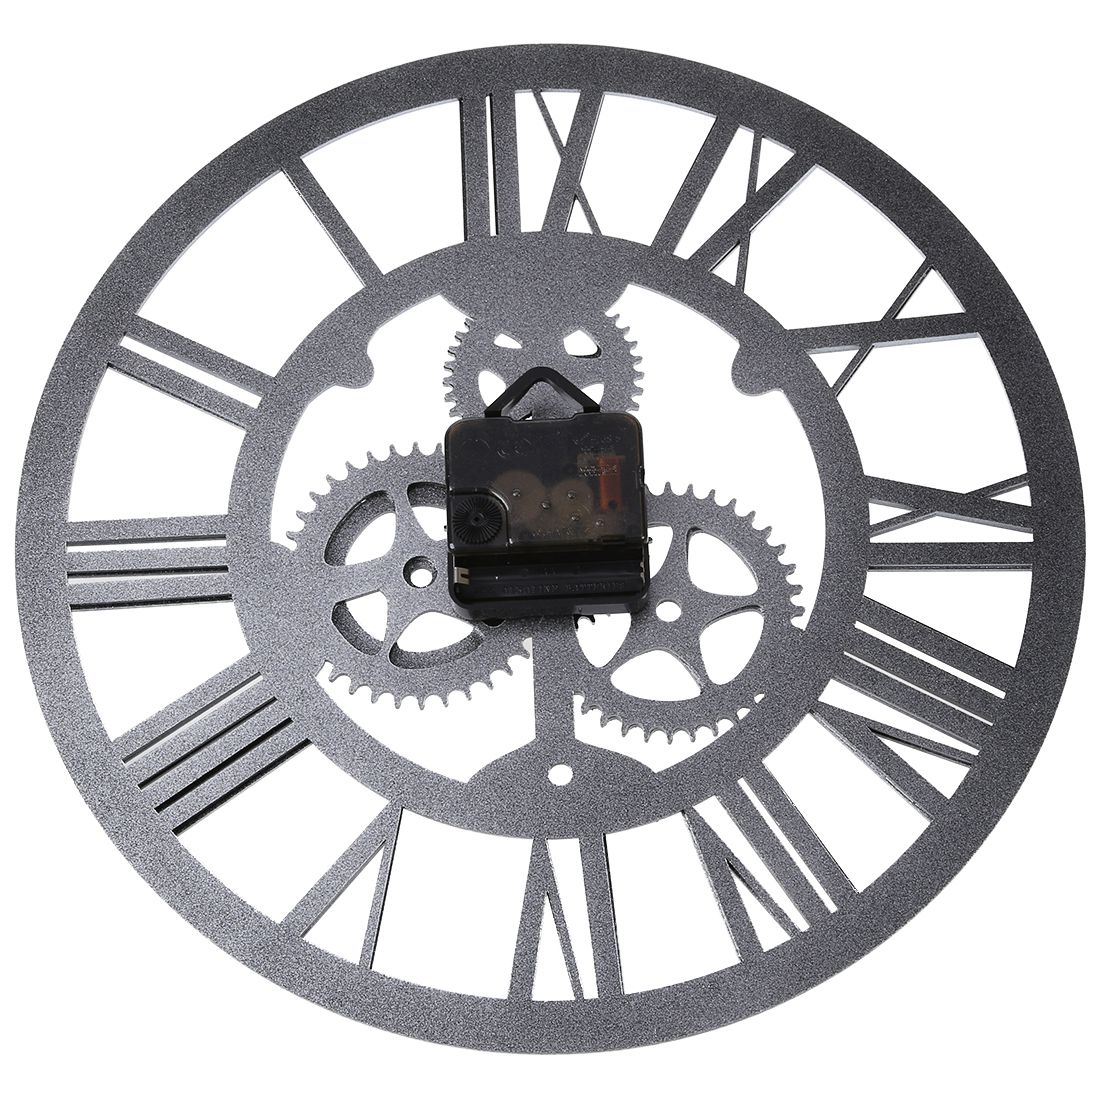 Vintage Antique Style 30cm Wall Clock Home Bedroom Retro Kitchen ...